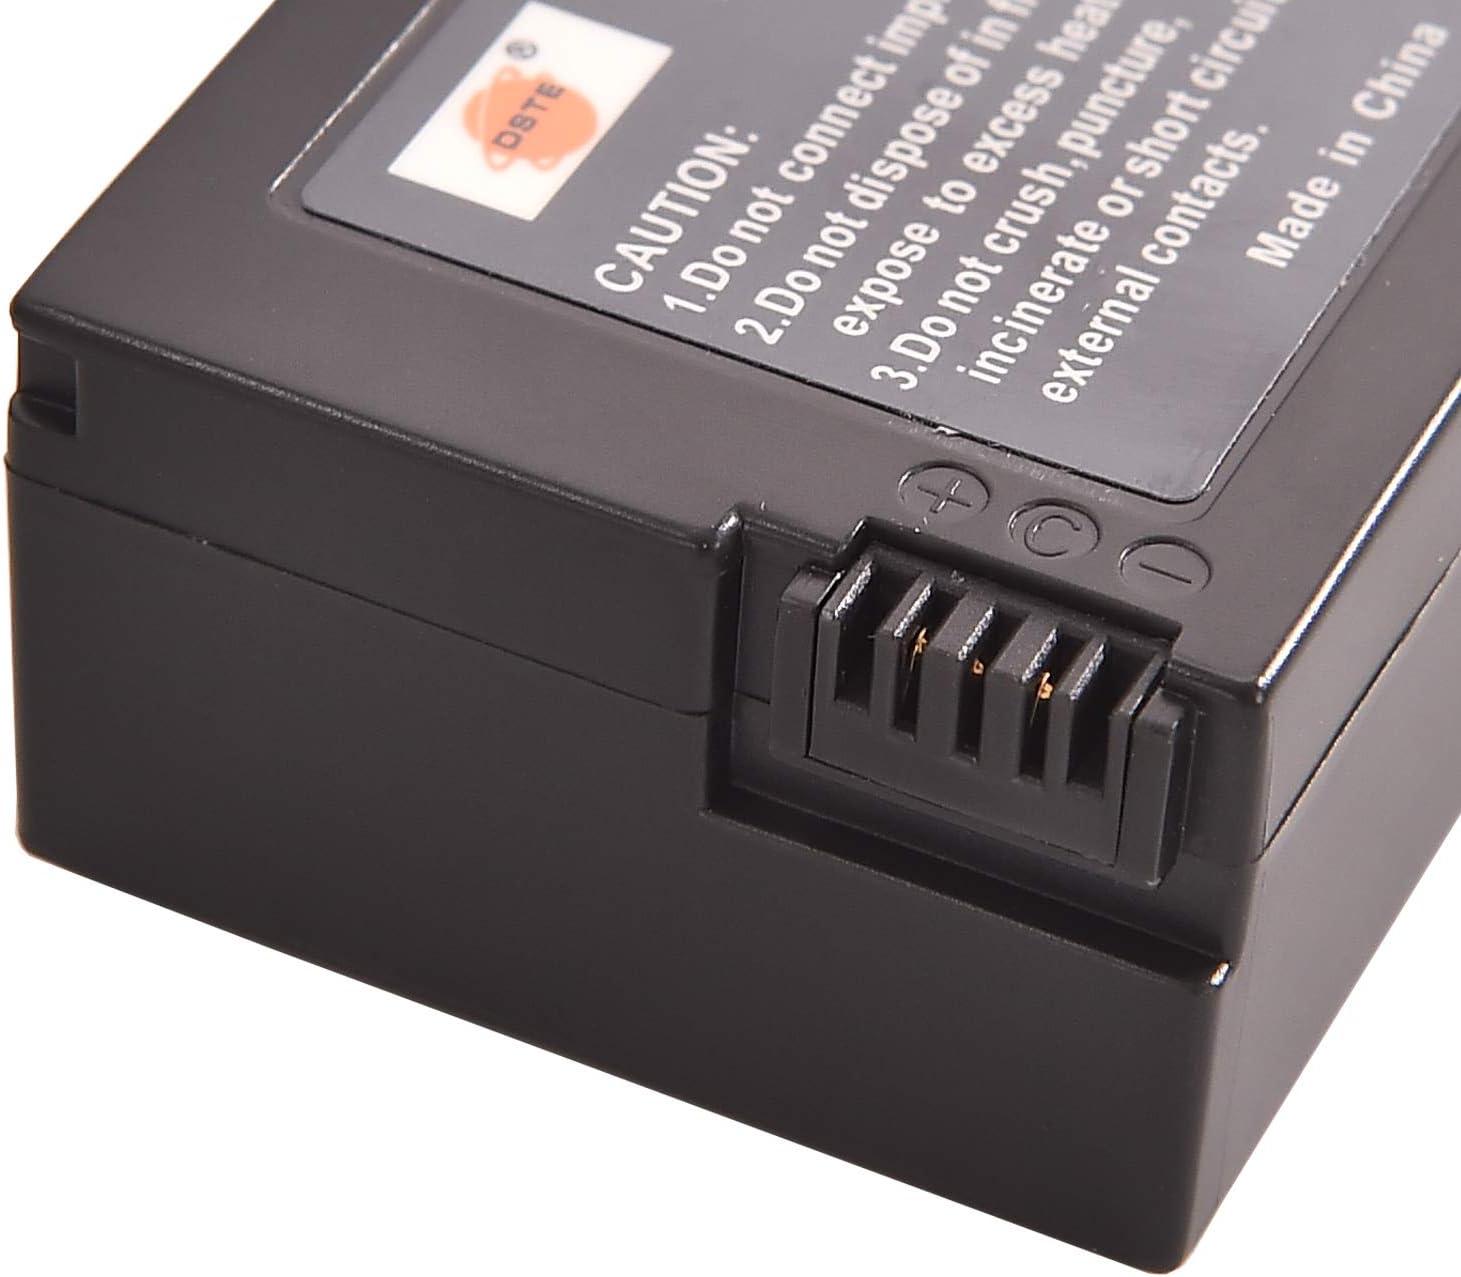 DSTE 2X NP-FM50 Repuesto Bater/ía Cargador USB Dual con Pantalla LCD Compatible para NP-FM55H NP-FM30 NP-FM51 NP-QM50 NP-QM51 y Sony CCD-TR208 CCD-TR408 CCD-TRV108 CCD-TRV116 CCD-TRV118 C/ámara